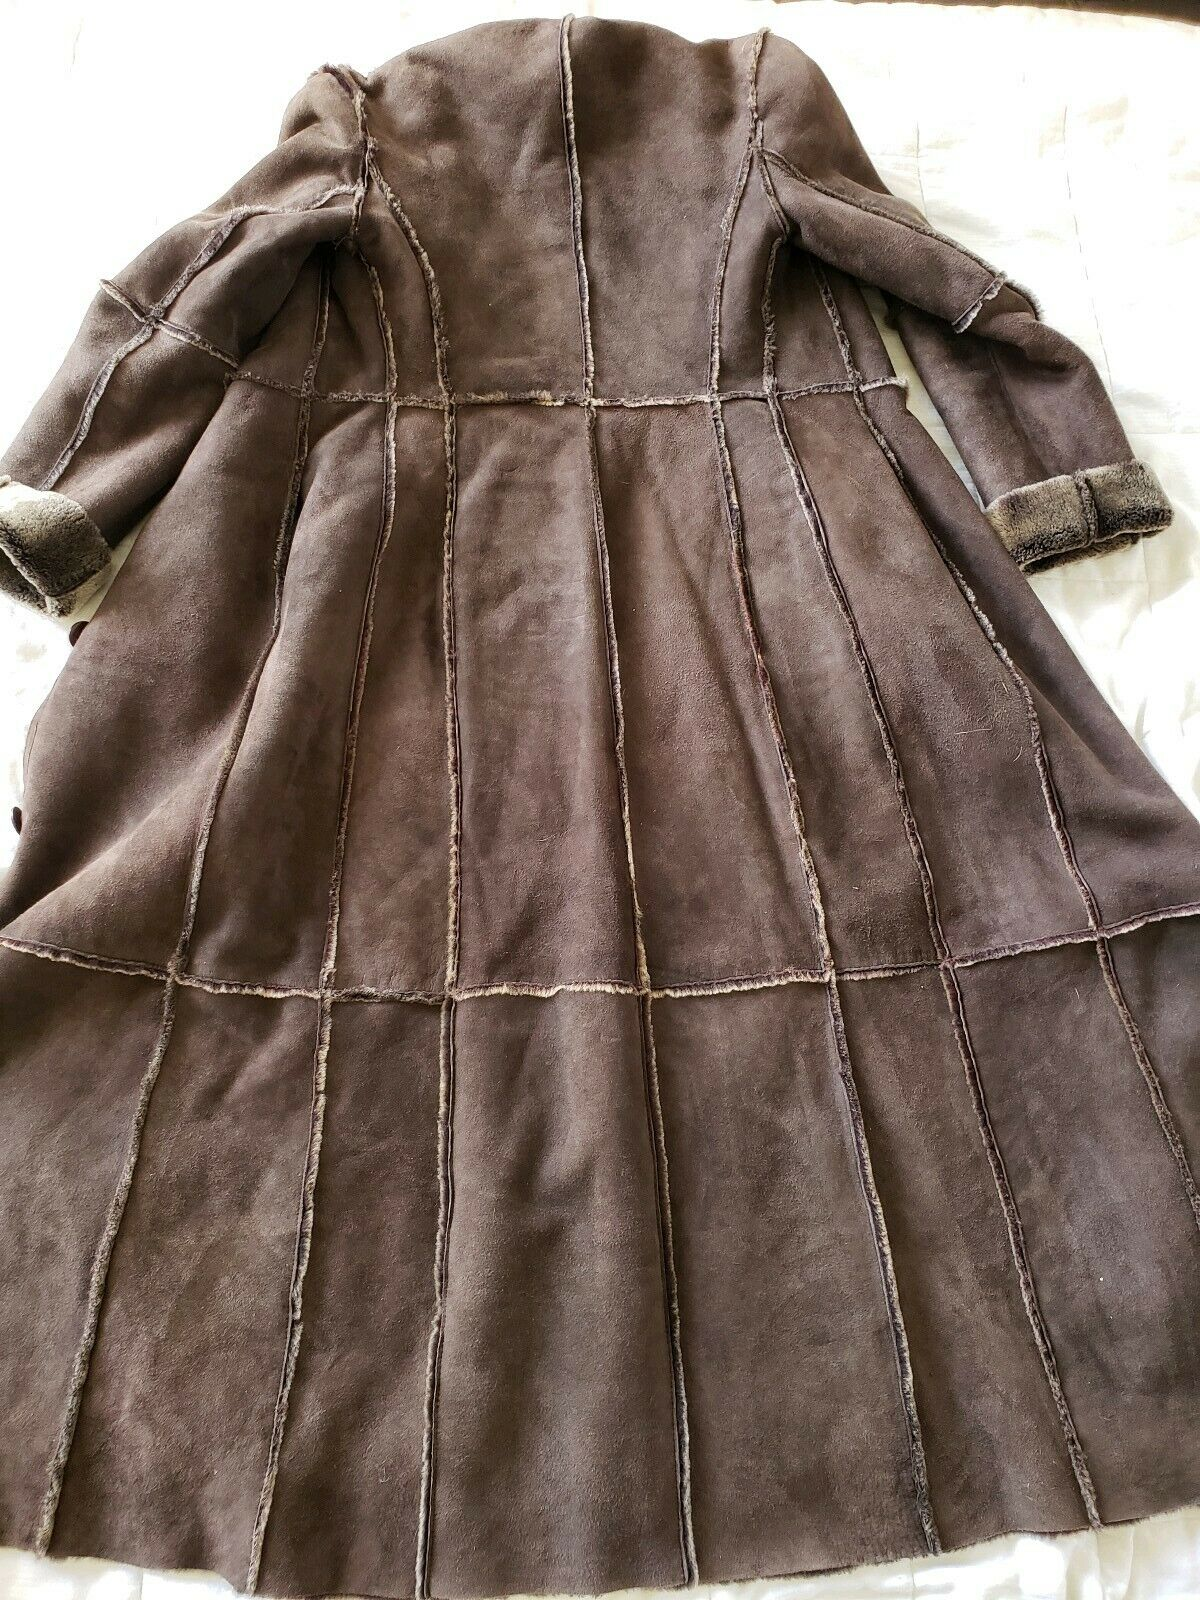 Workshop NY full length shearling coat lightweigh… - image 6